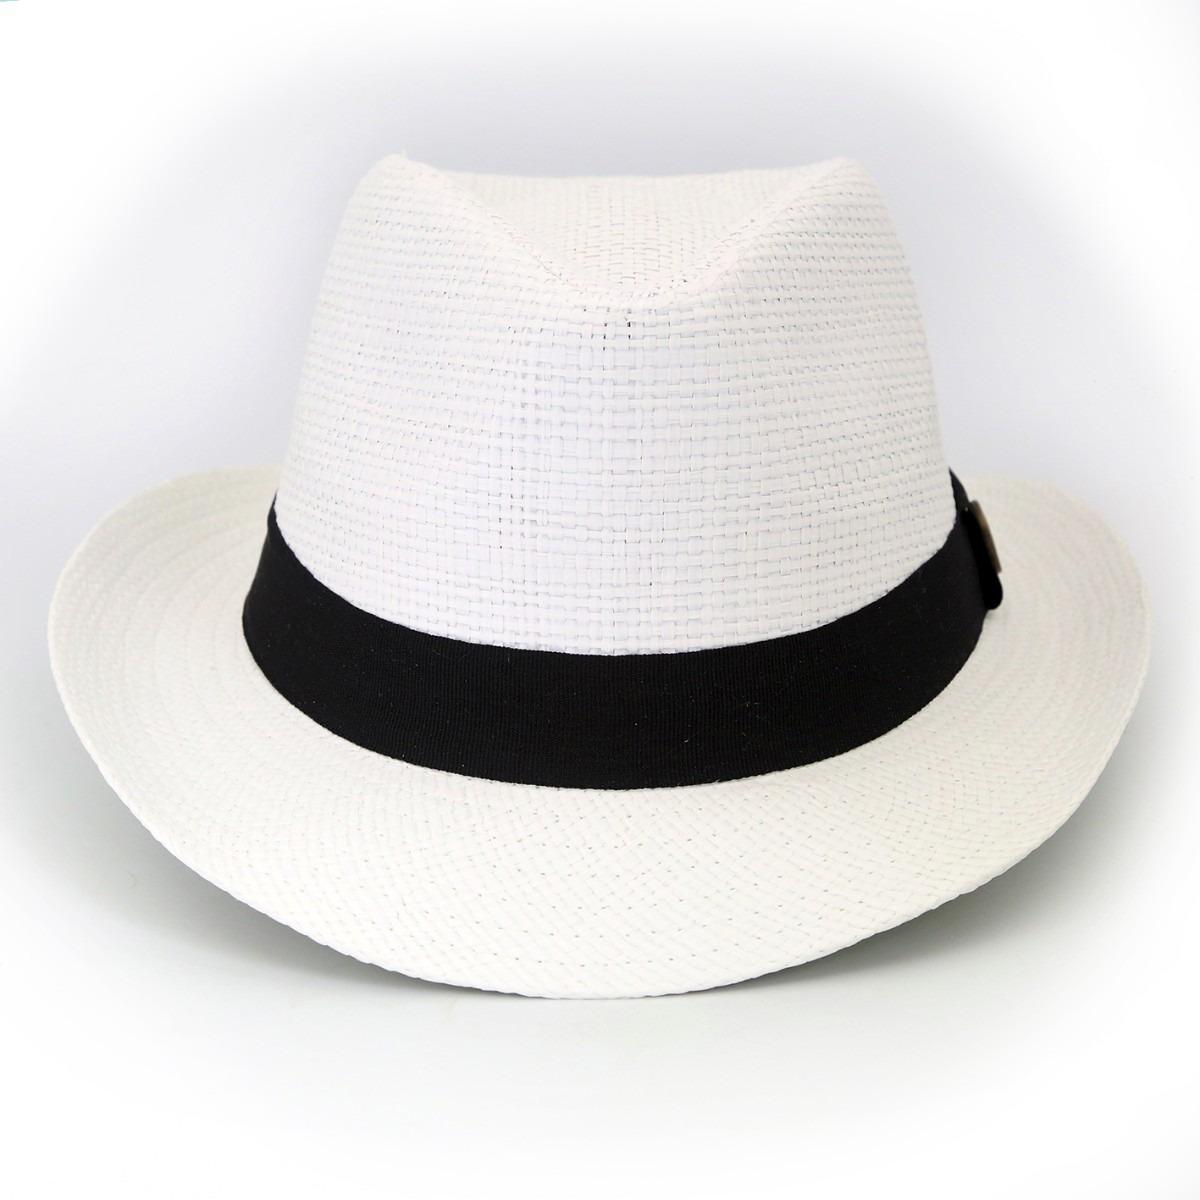 21b473a615a38 Chapéu Malandro Praiano Tipo Panamá Masculino feminino - R  27